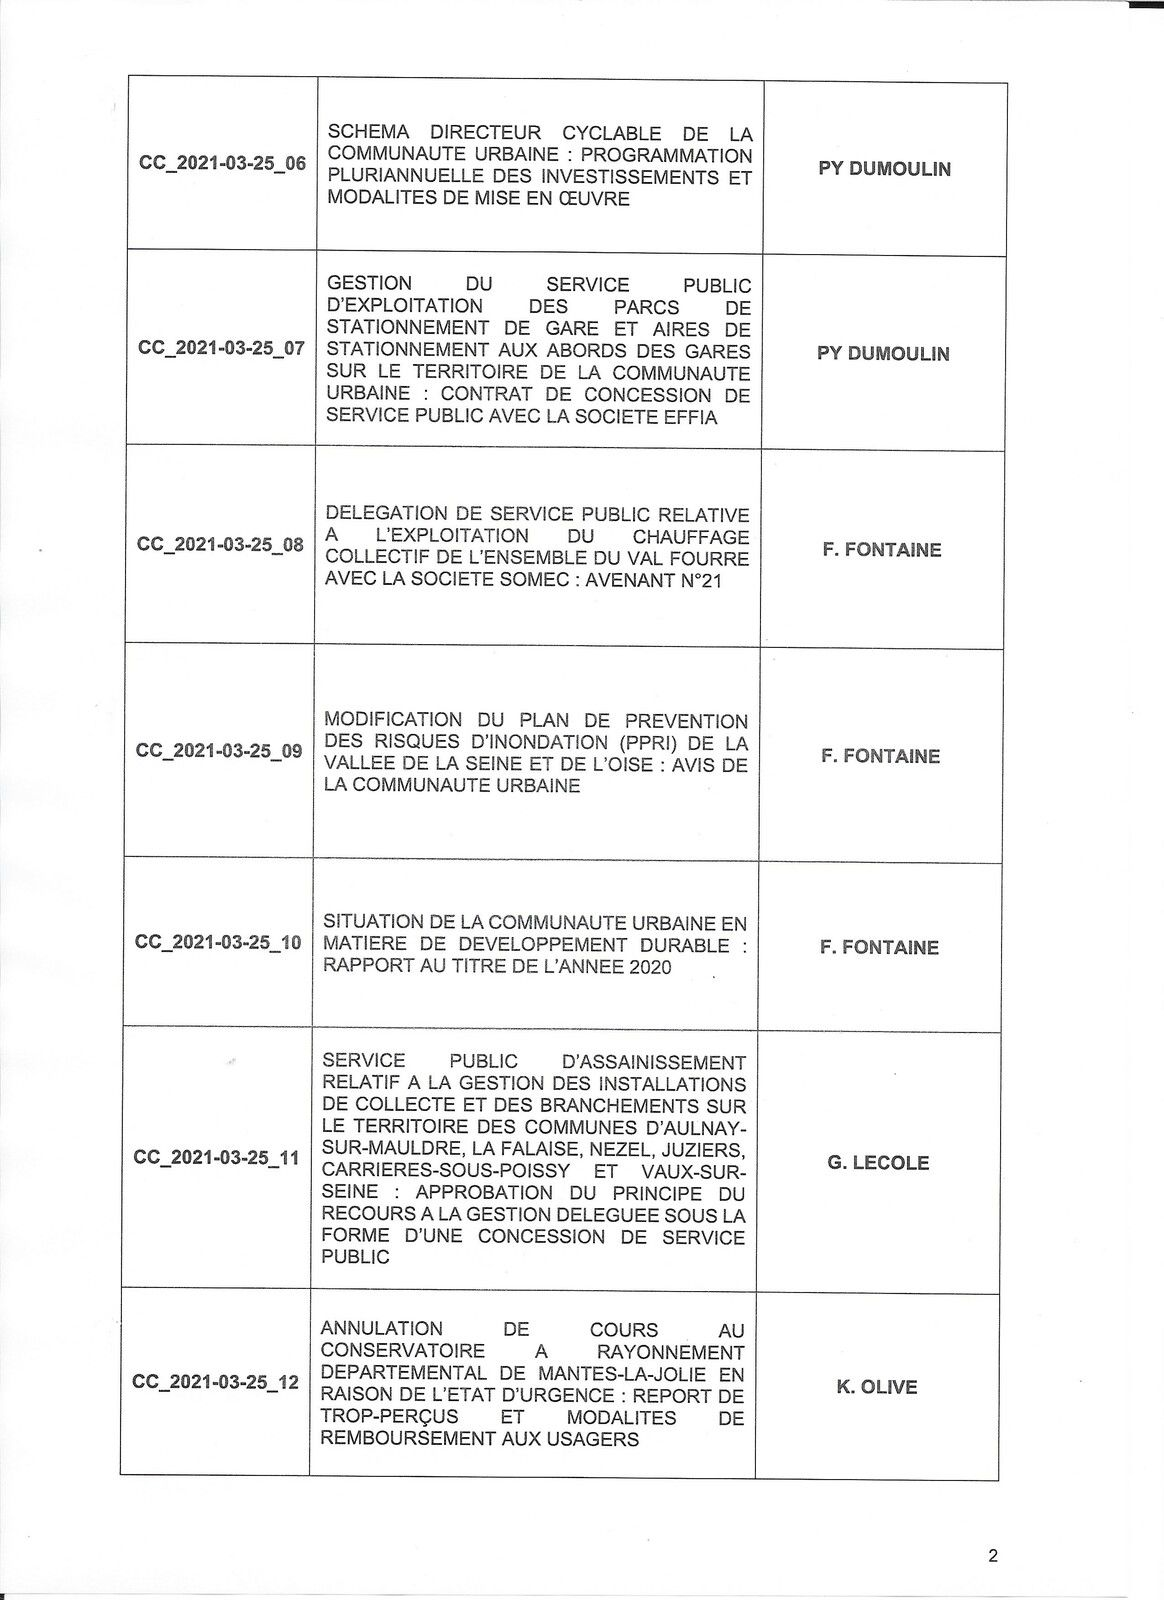 GPSEO. Conseil communautaire du 25 mars 2021